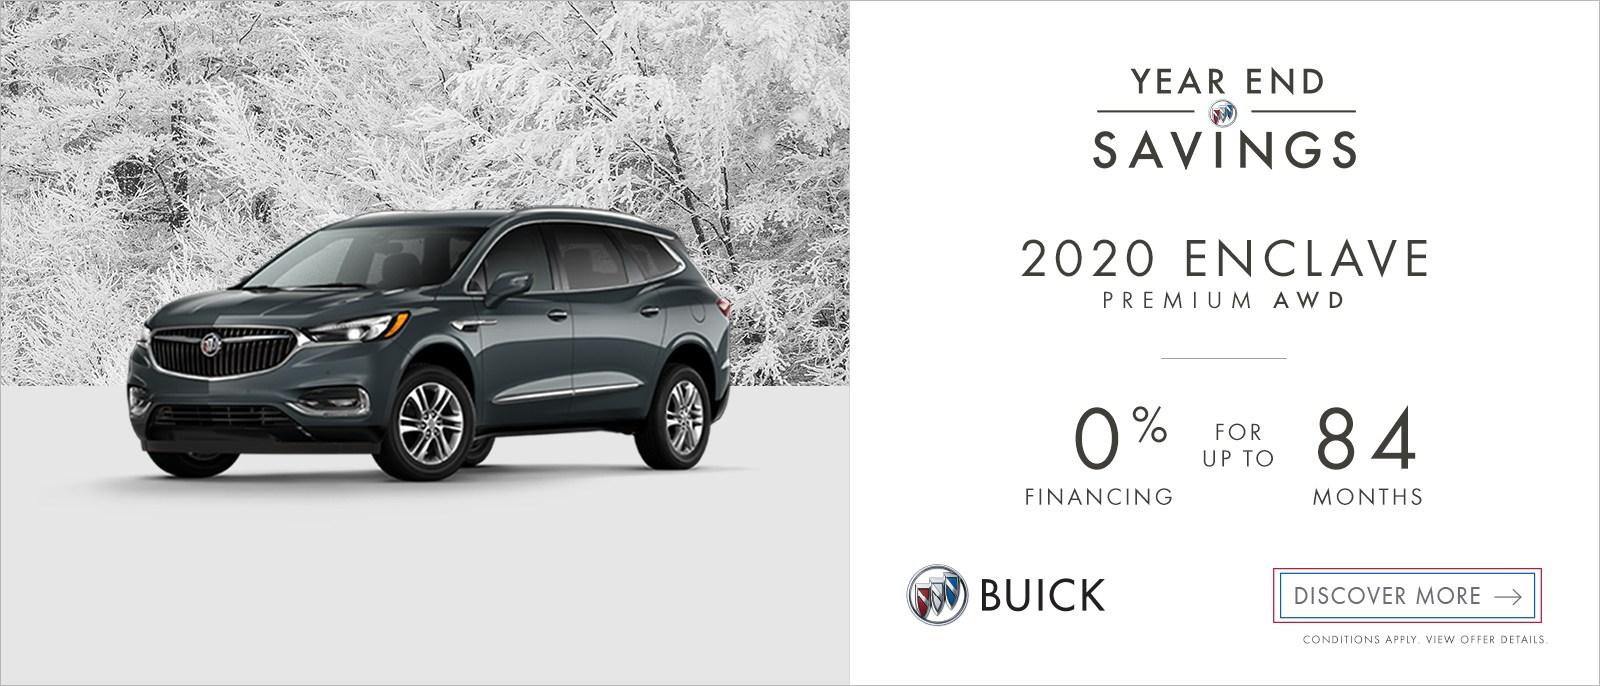 Year End Savings – 2020 Buick Enclave Premium AWD